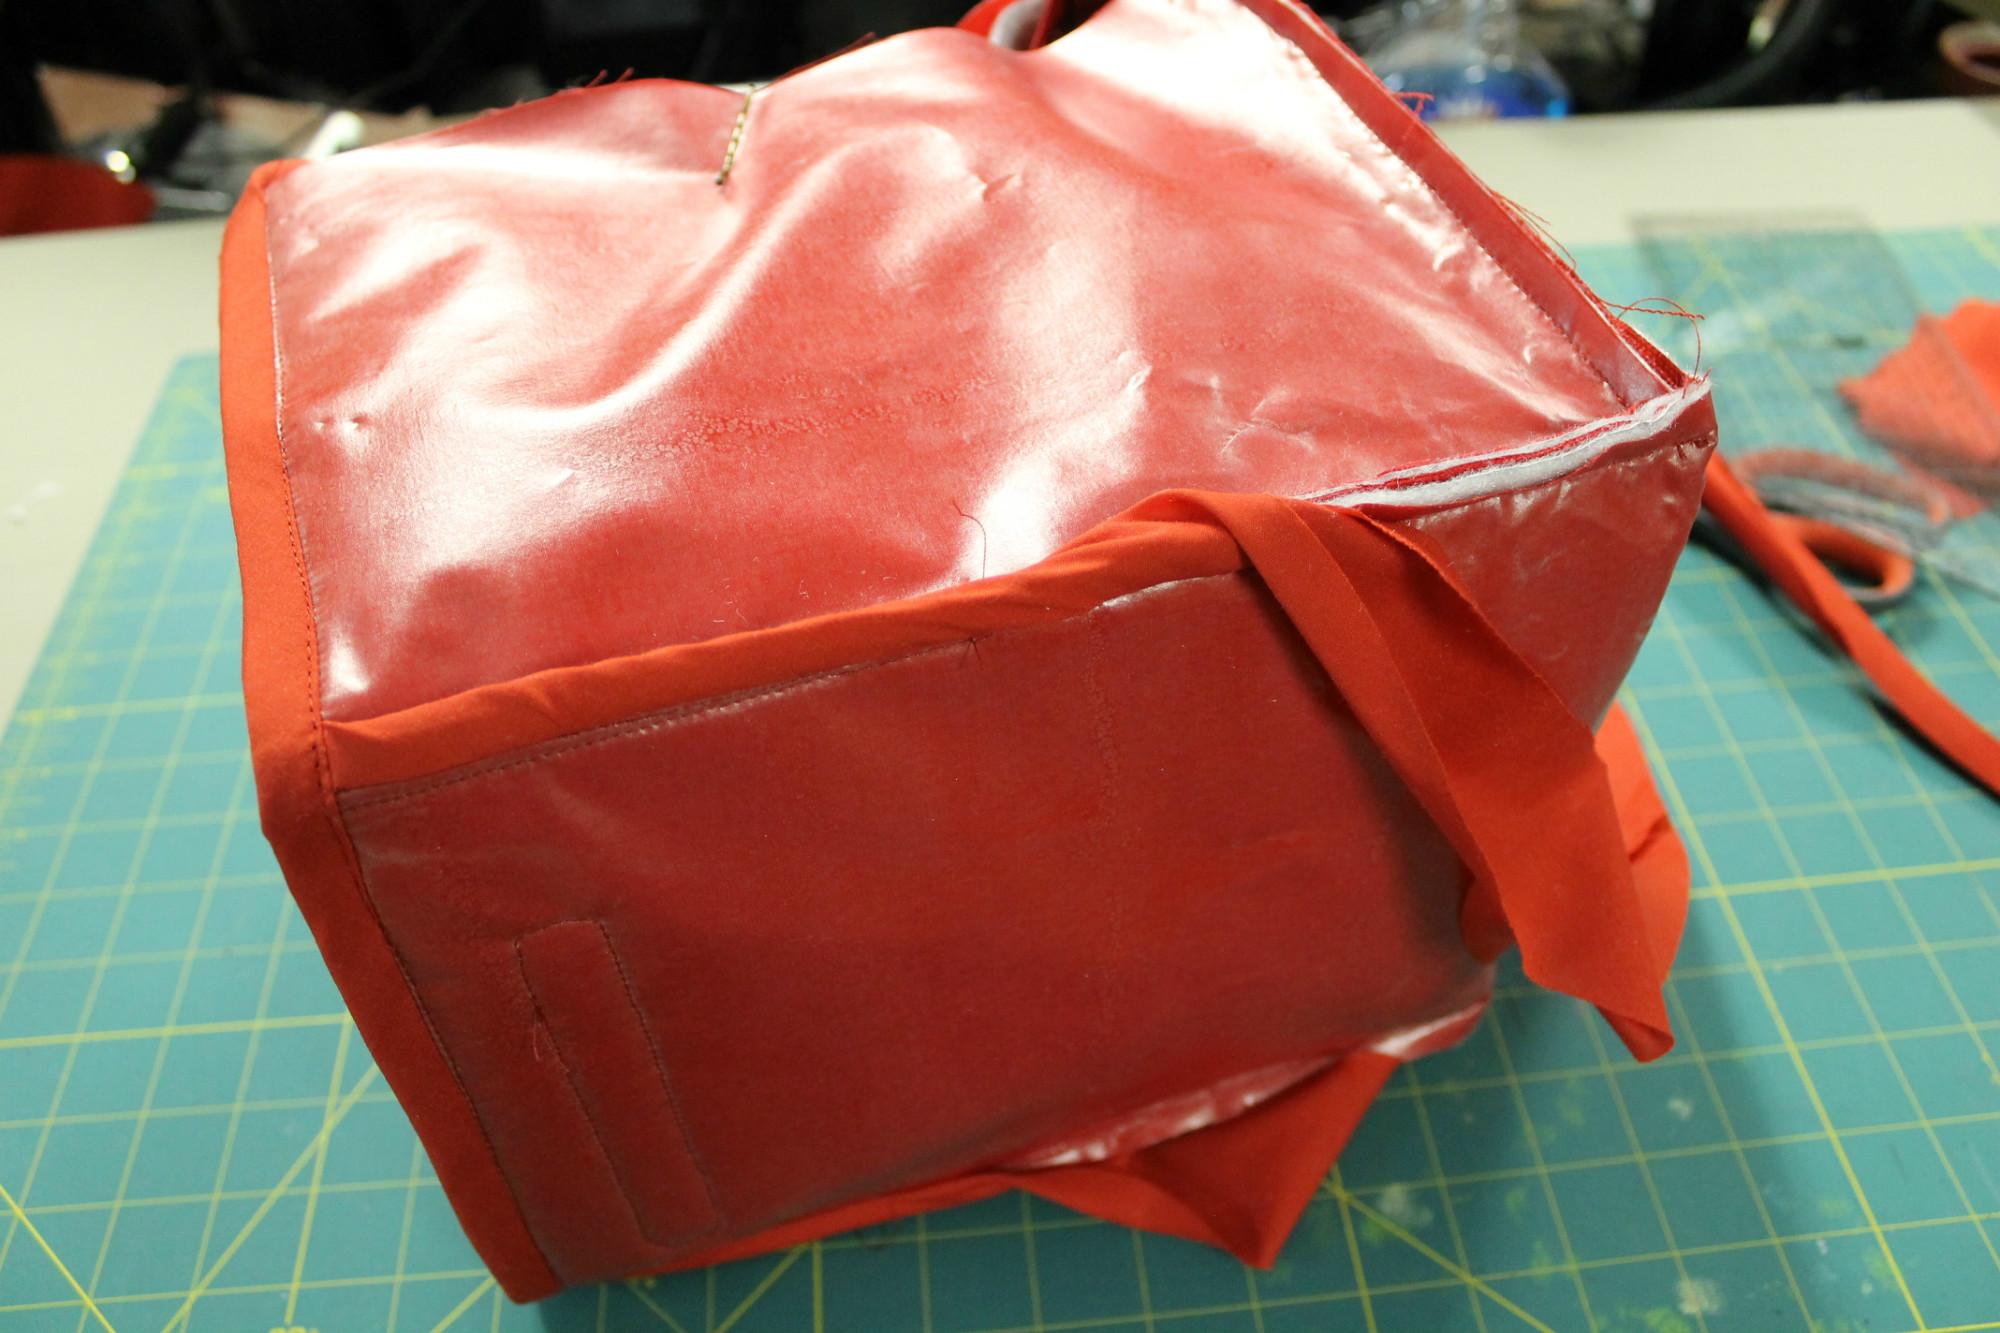 Binding the inside seams